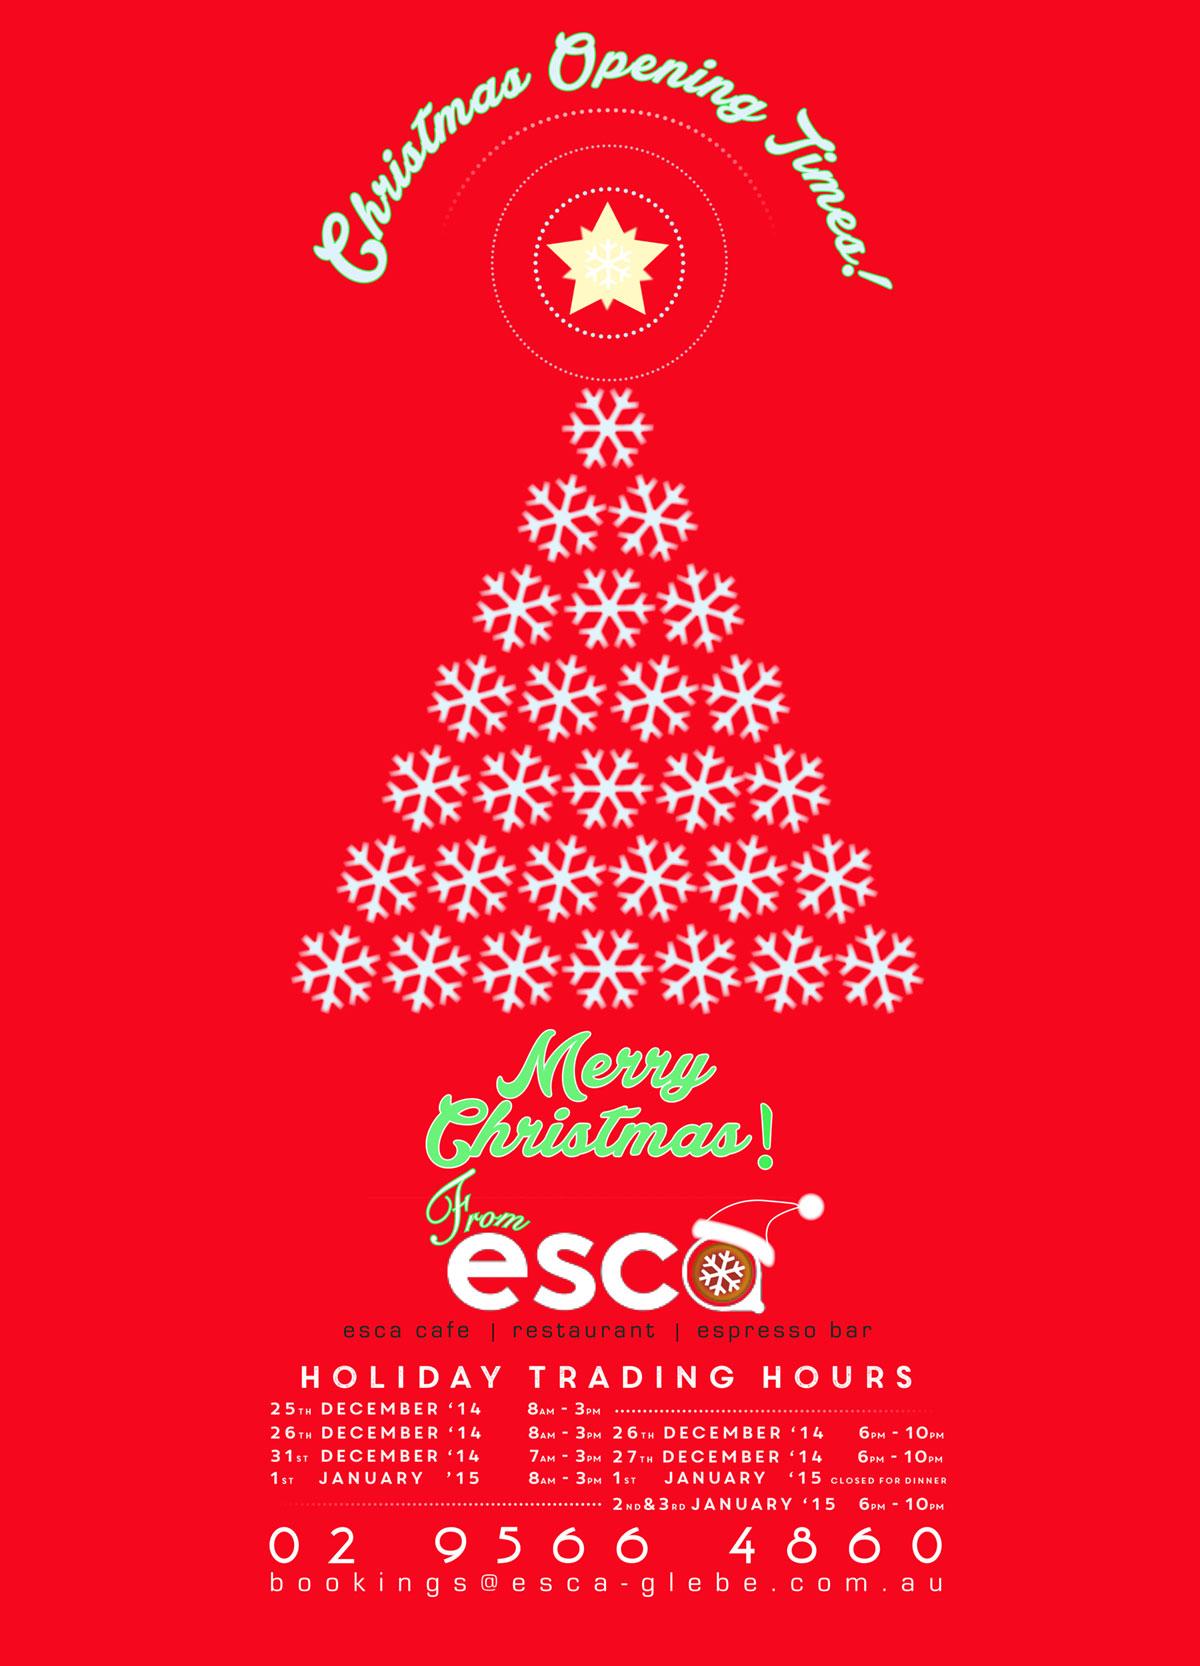 Christmas Restaurant Poster.Esca Christmas Poster Rob Everett Design